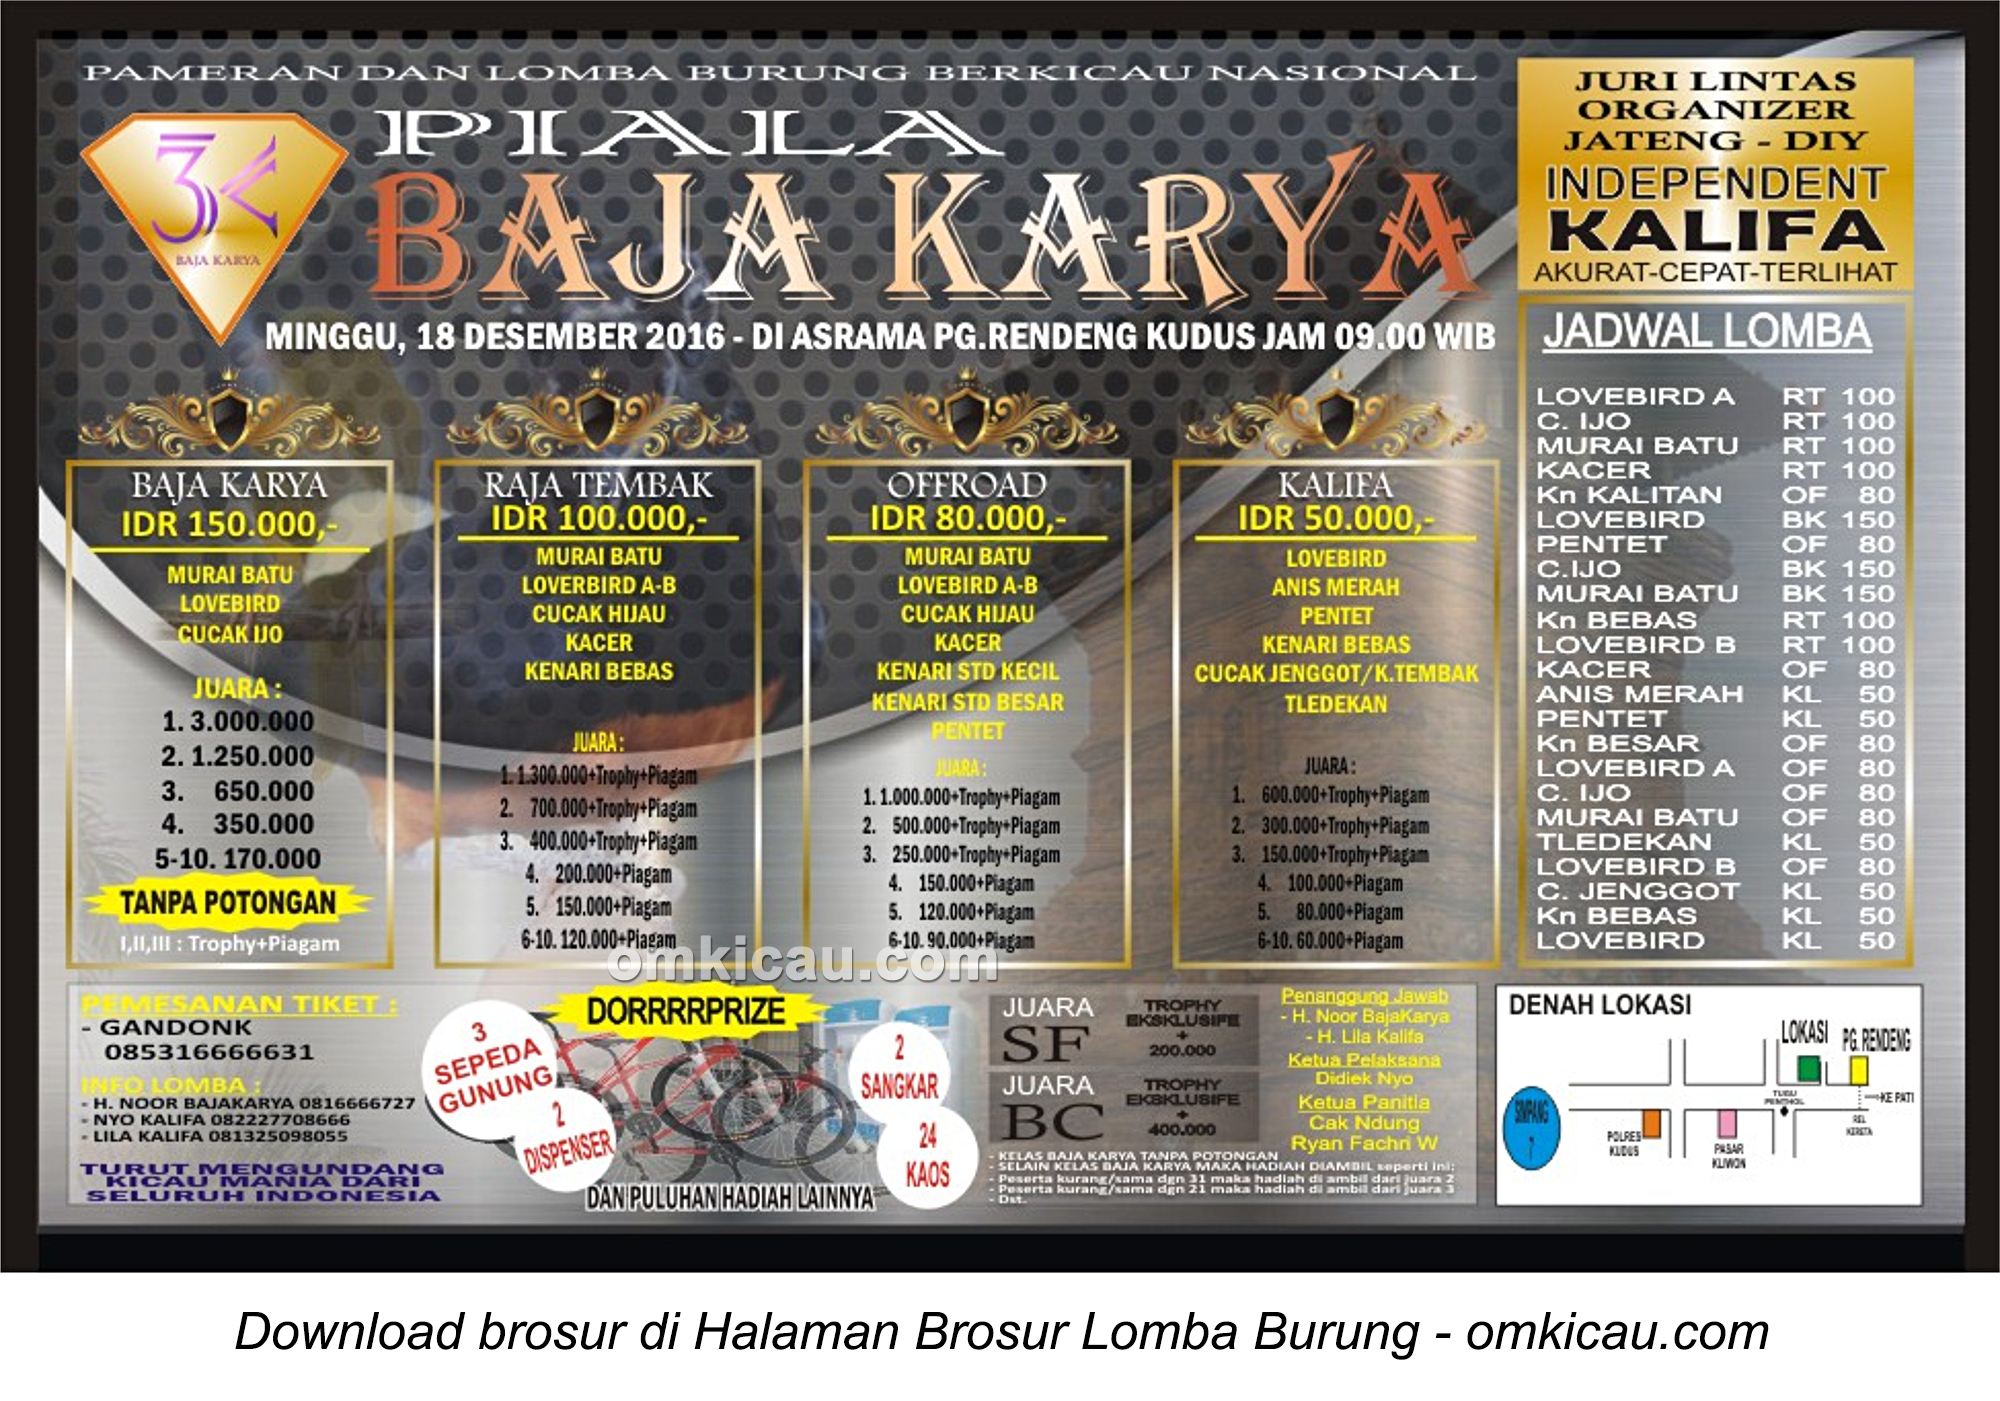 Brosur Terbaru Lomba Burung Berkicau Piala Baja Karya, Kudus, 18 Desember 2016